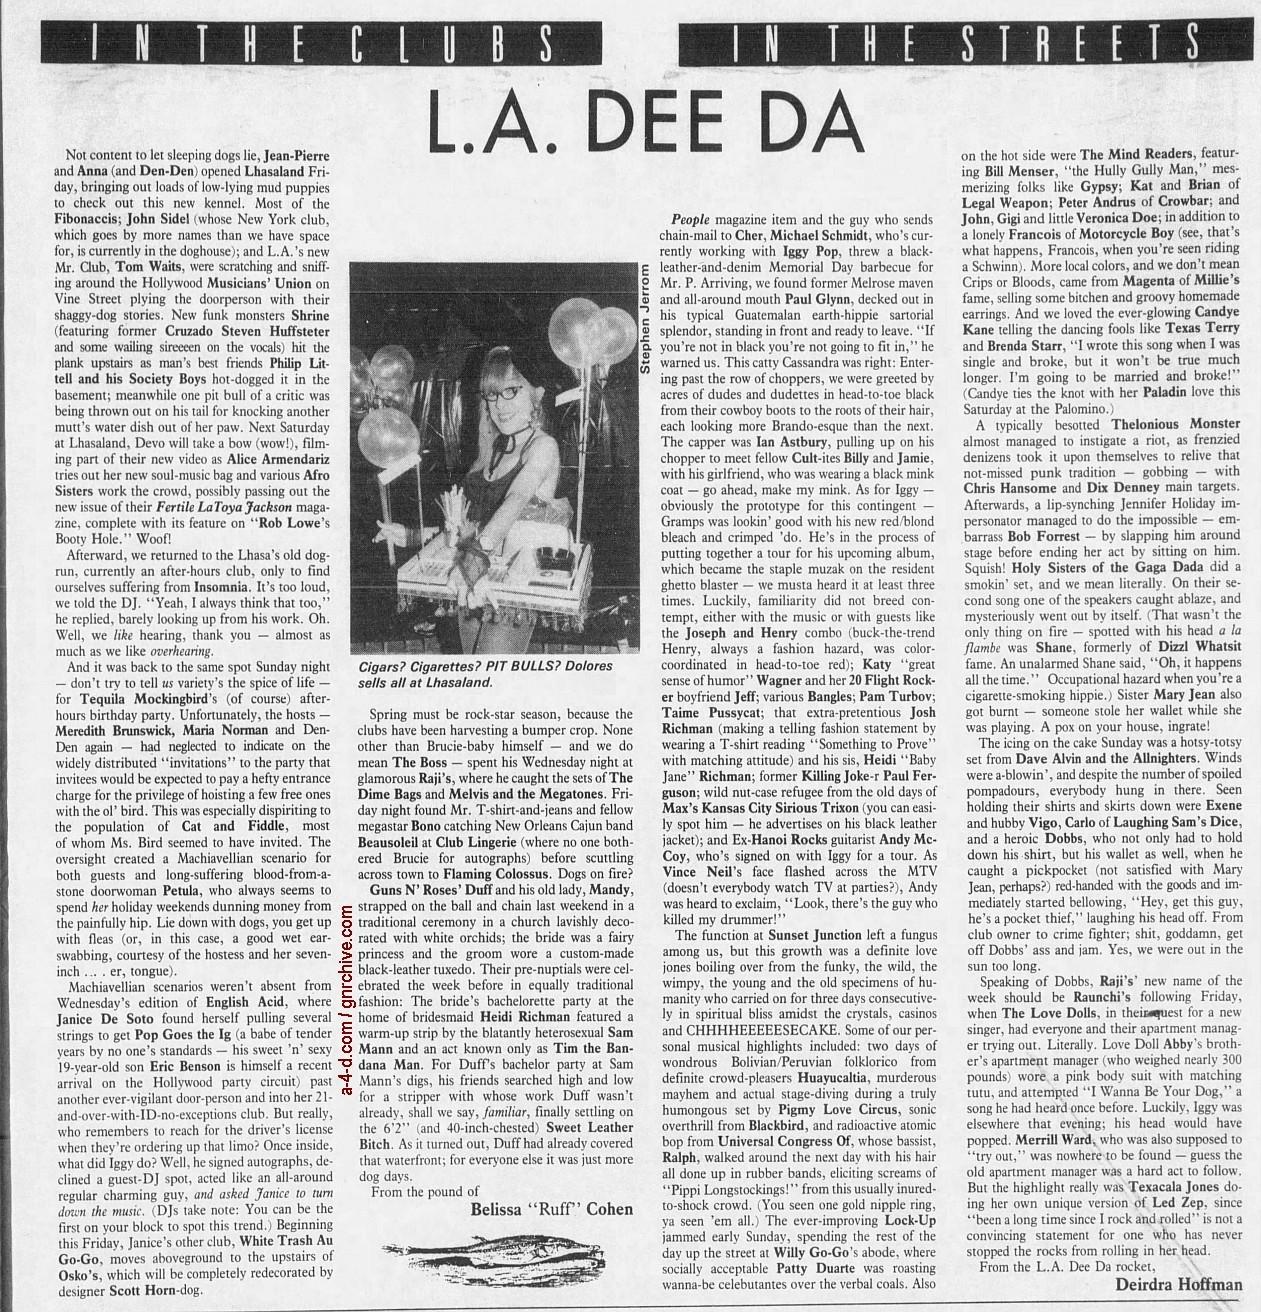 1988.06.03 - L.A. Weekly - L.A. Dee Da [Duff's wedding] 1988_083